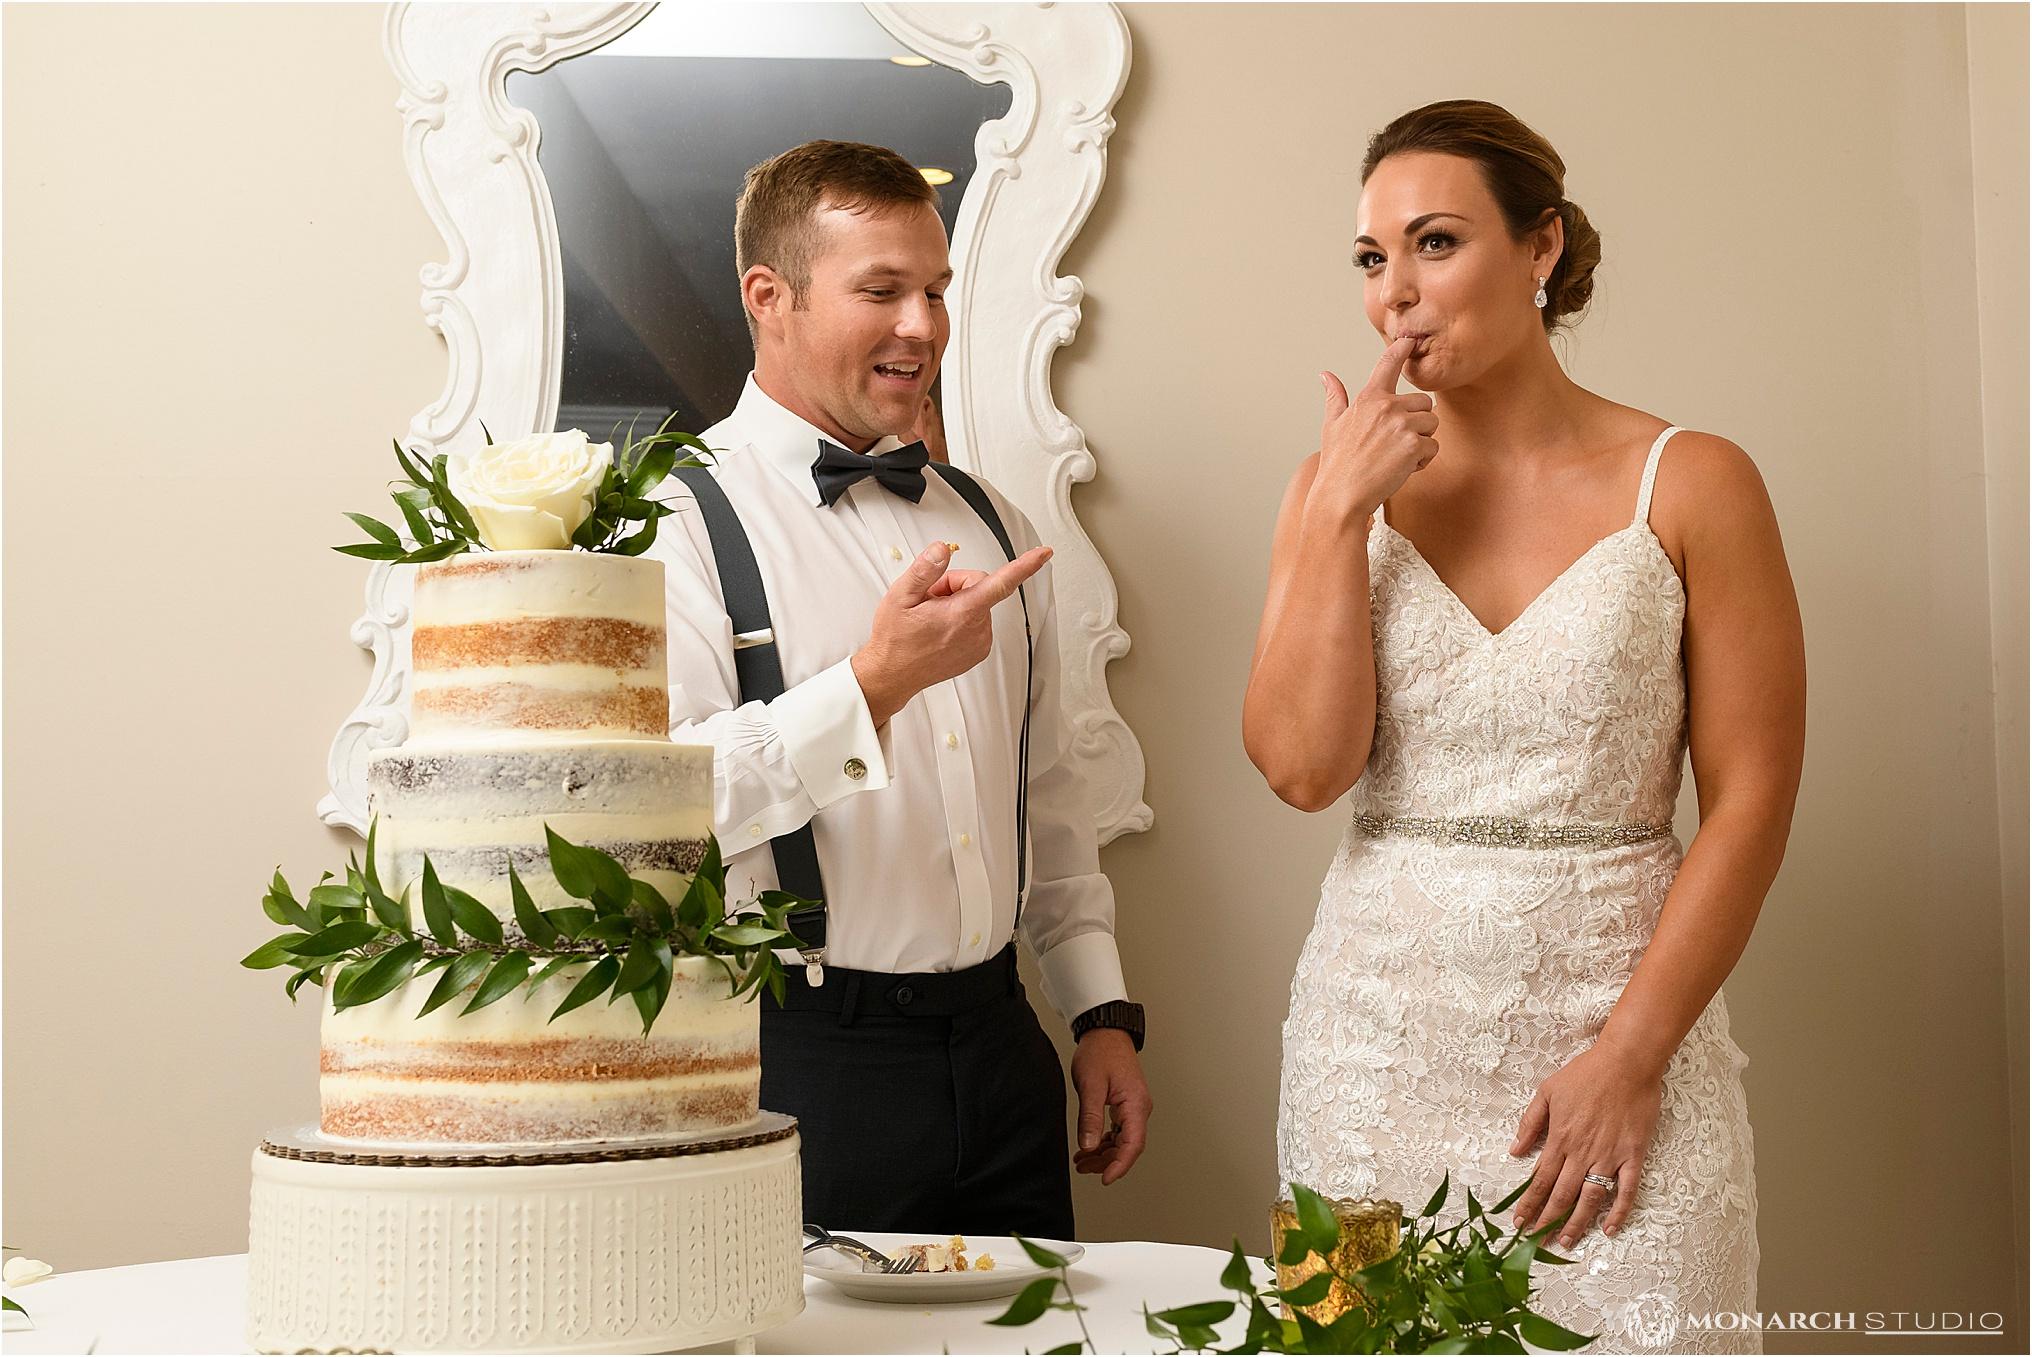 104-whiteroom-wedding-photographer-2019-05-22_0086.jpg